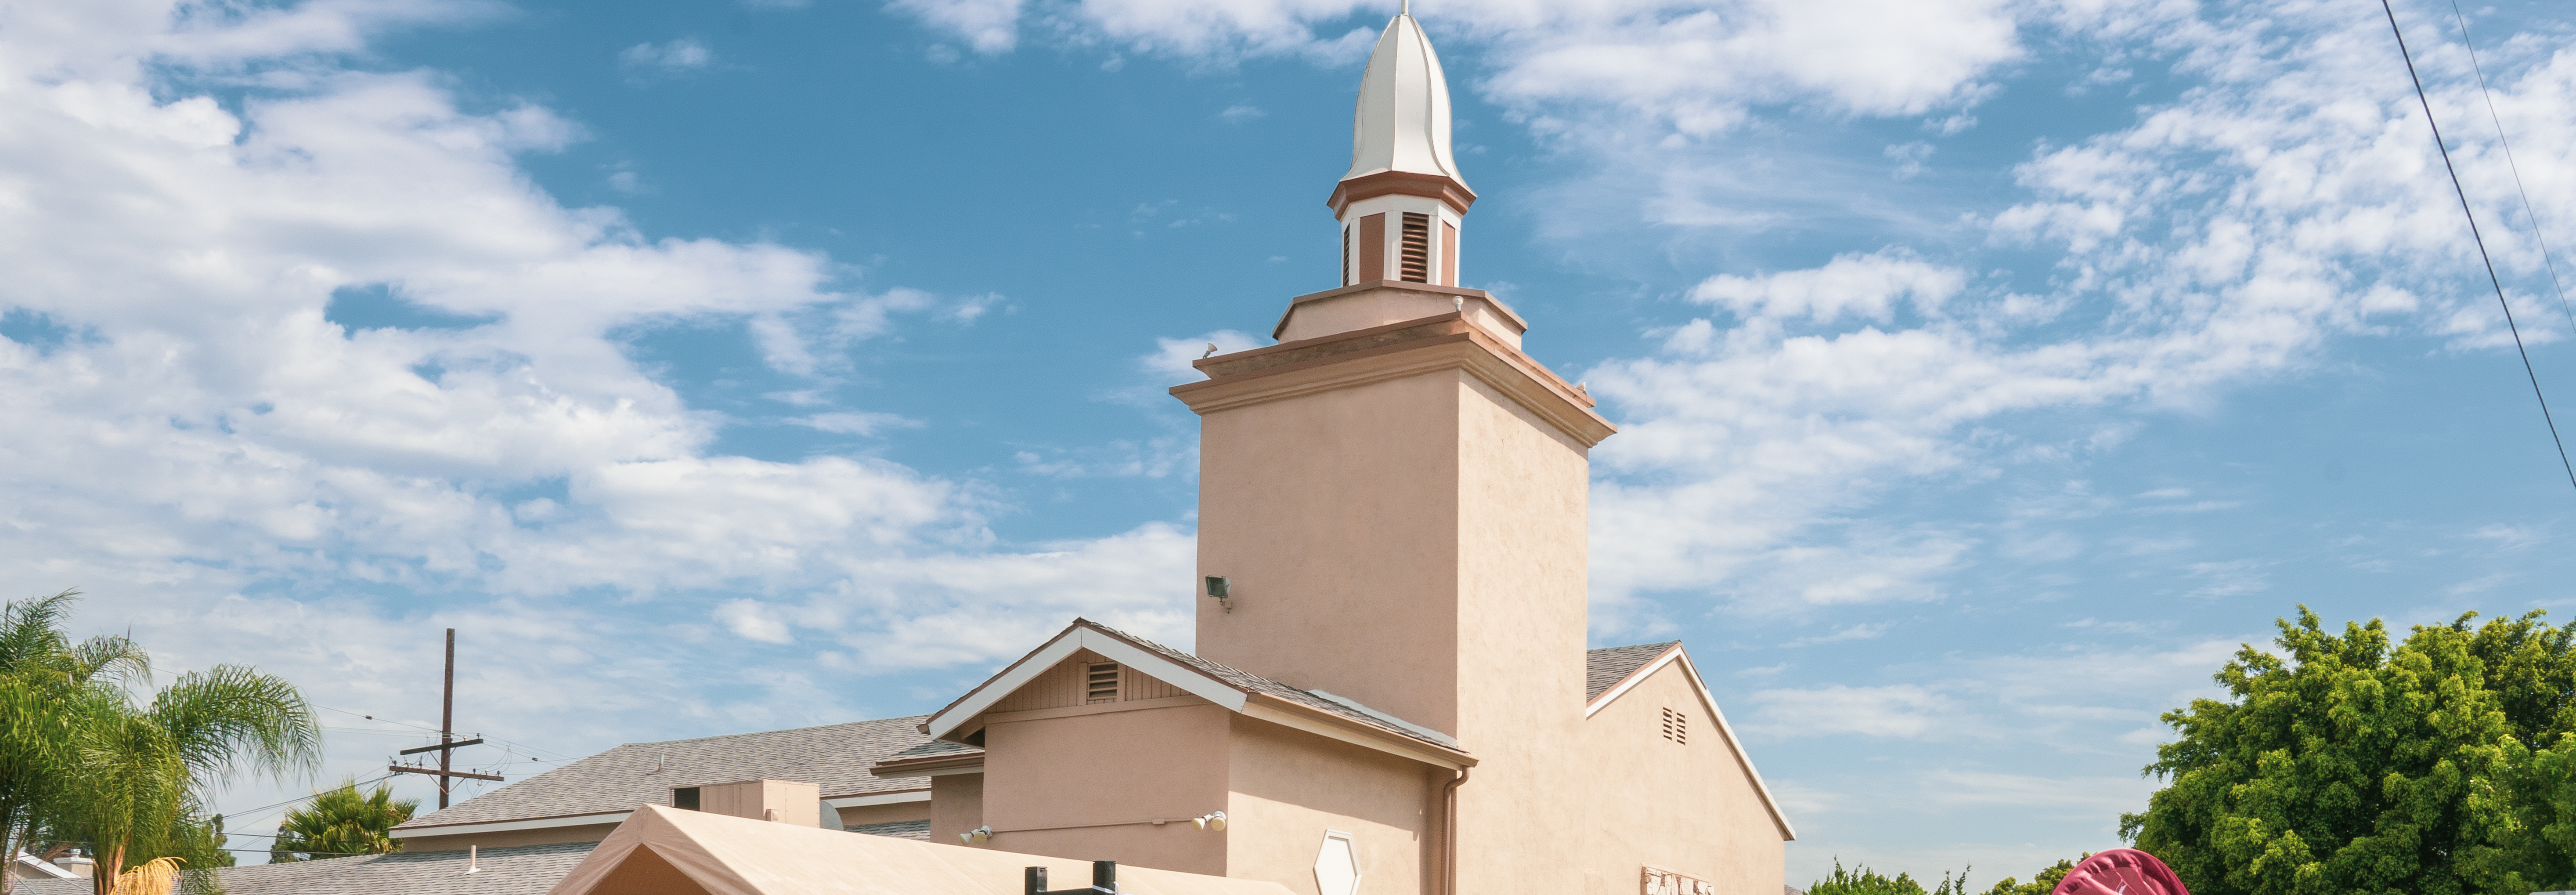 BGBC Church Exterior